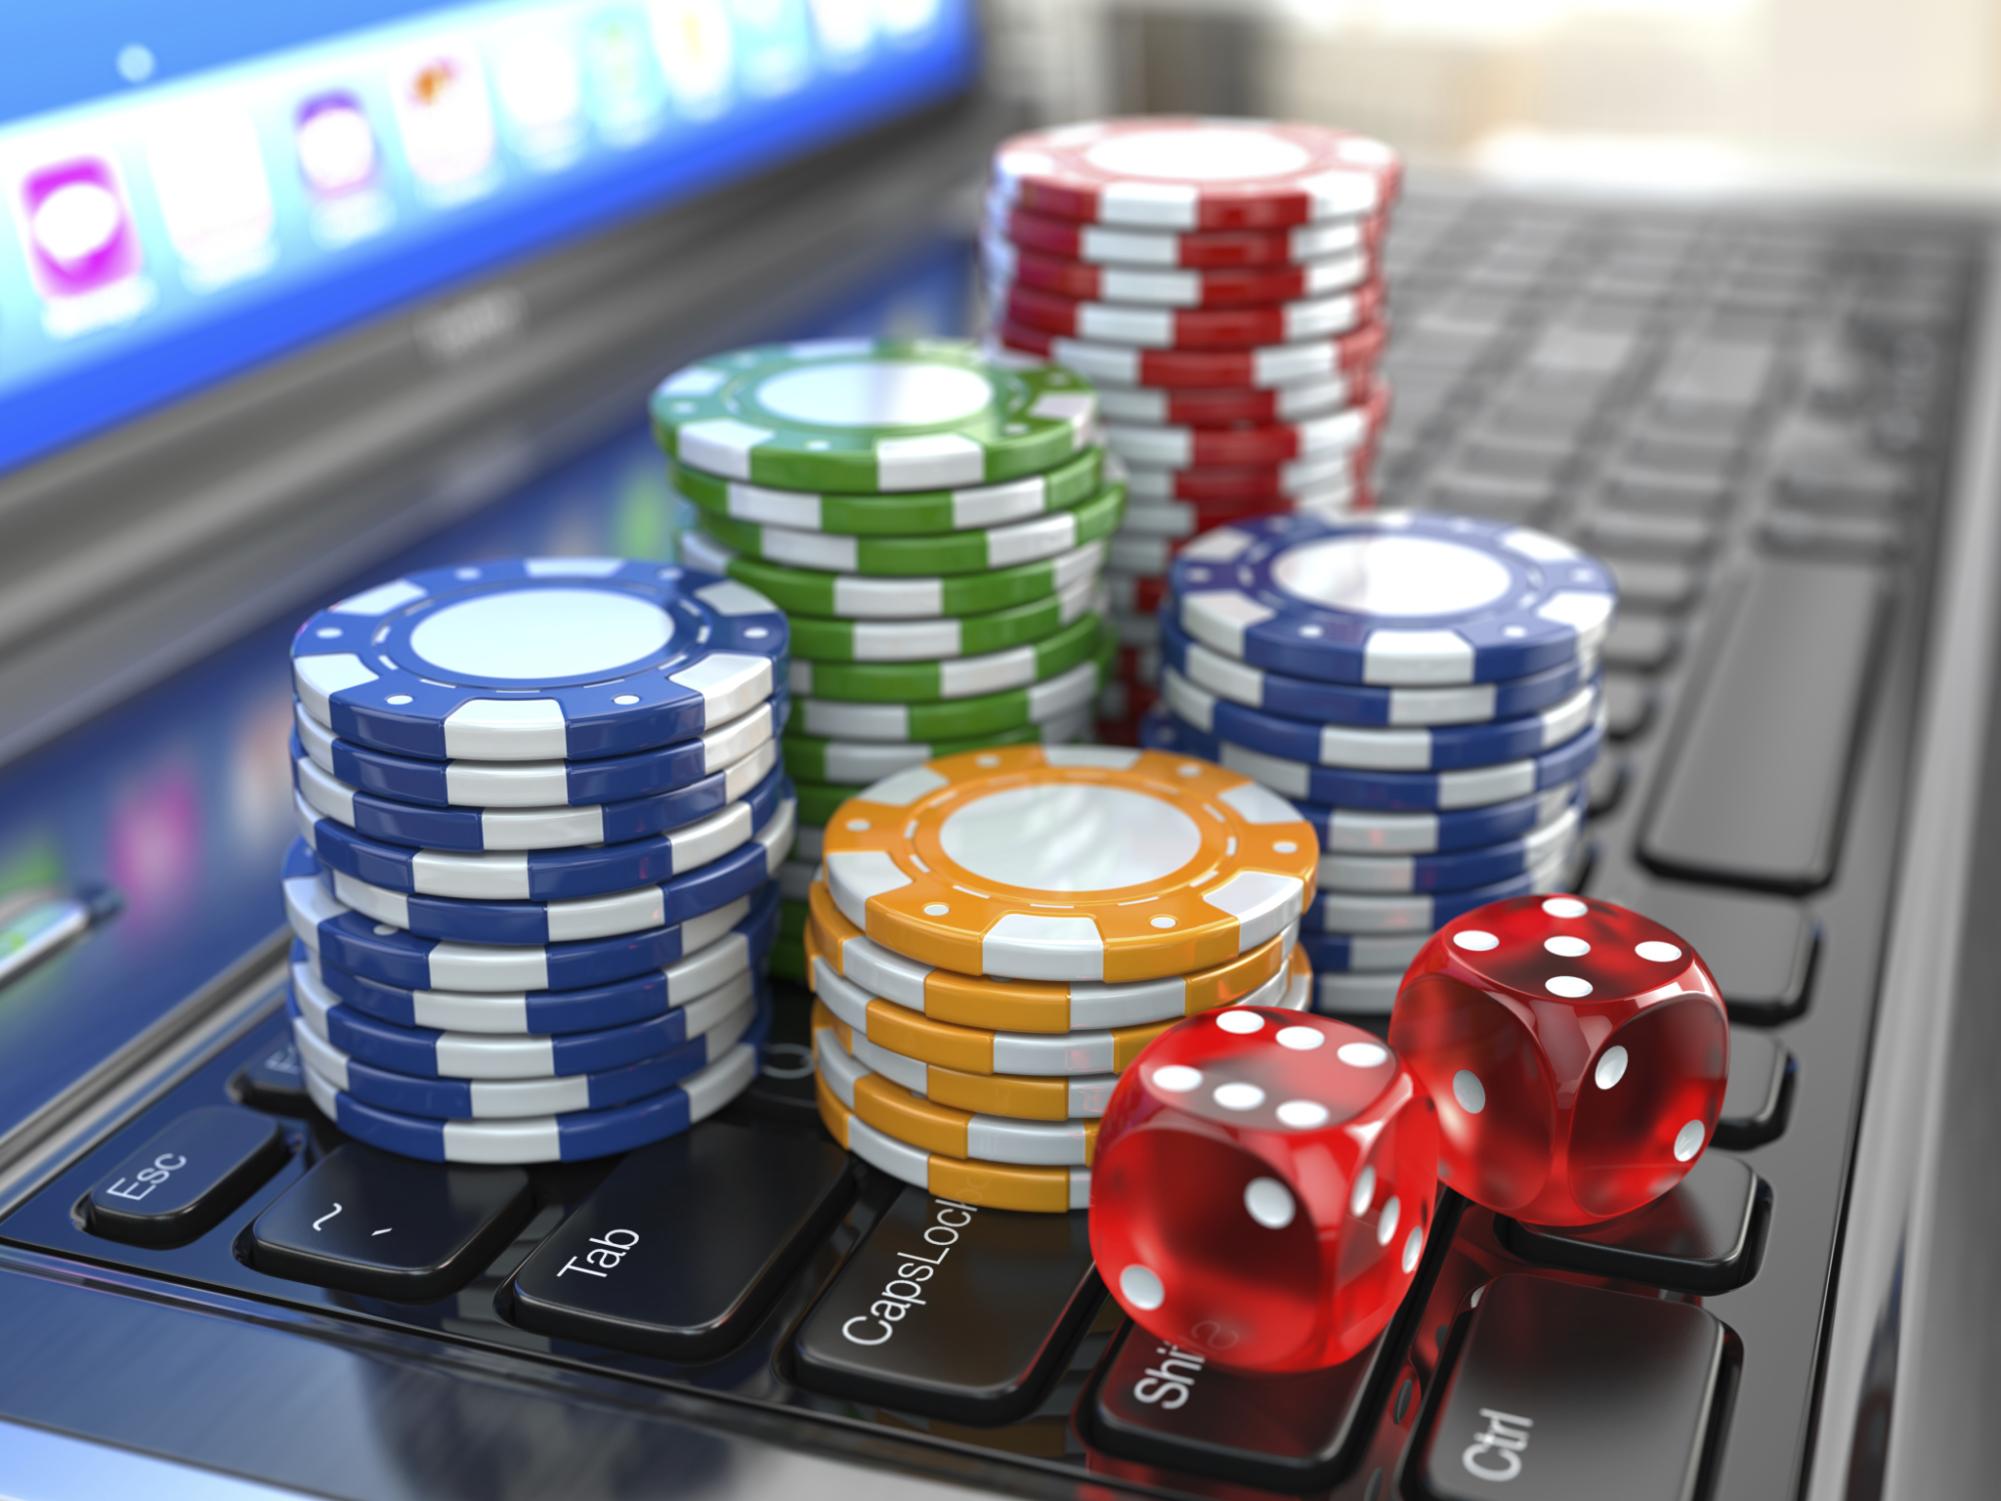 Fascinating attributes of online football gambling